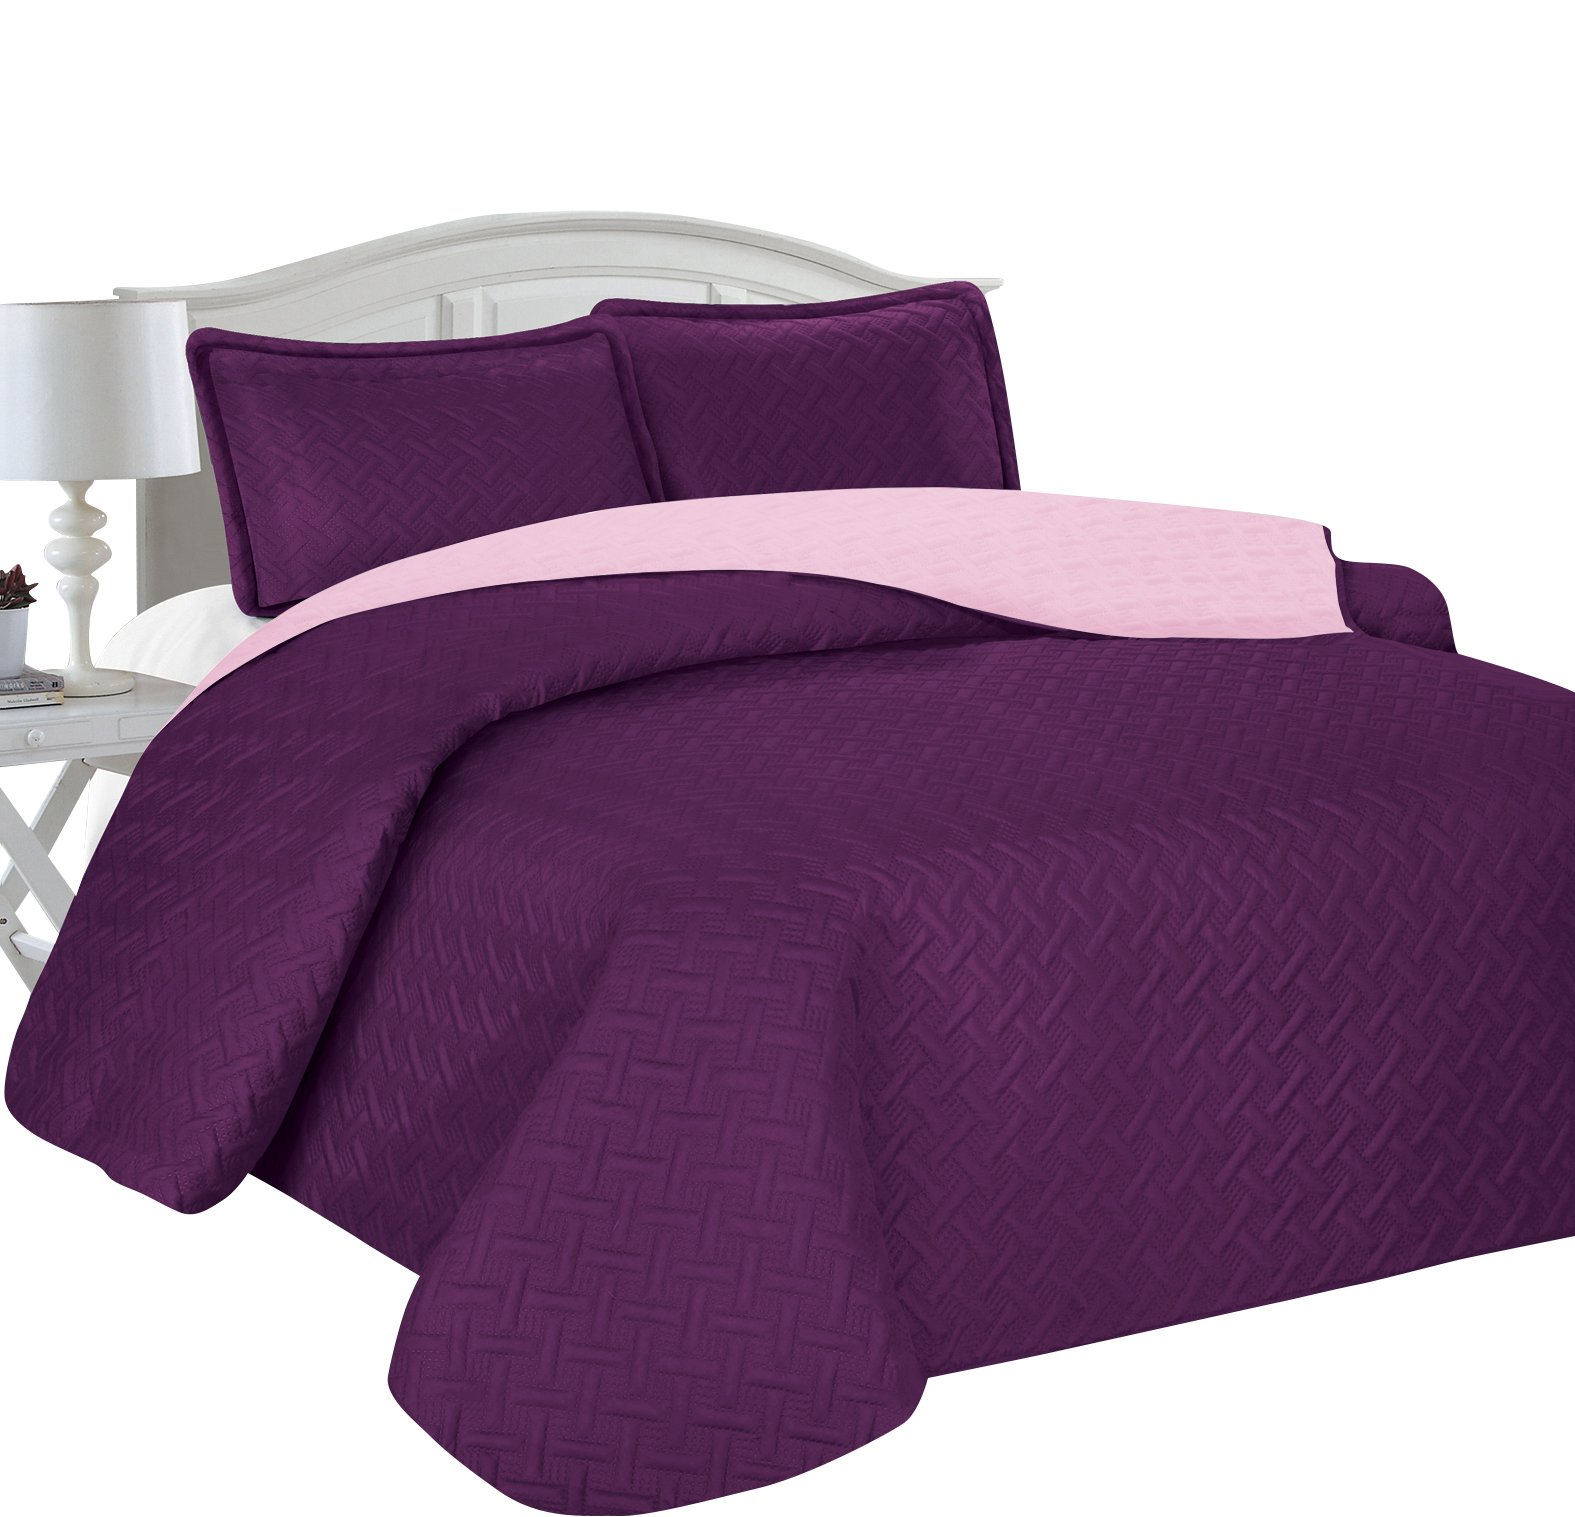 Home Sweet Home Victoria Design Reversible 3 PC Quilt Bedspread Sets (King, Purple/Lavender)